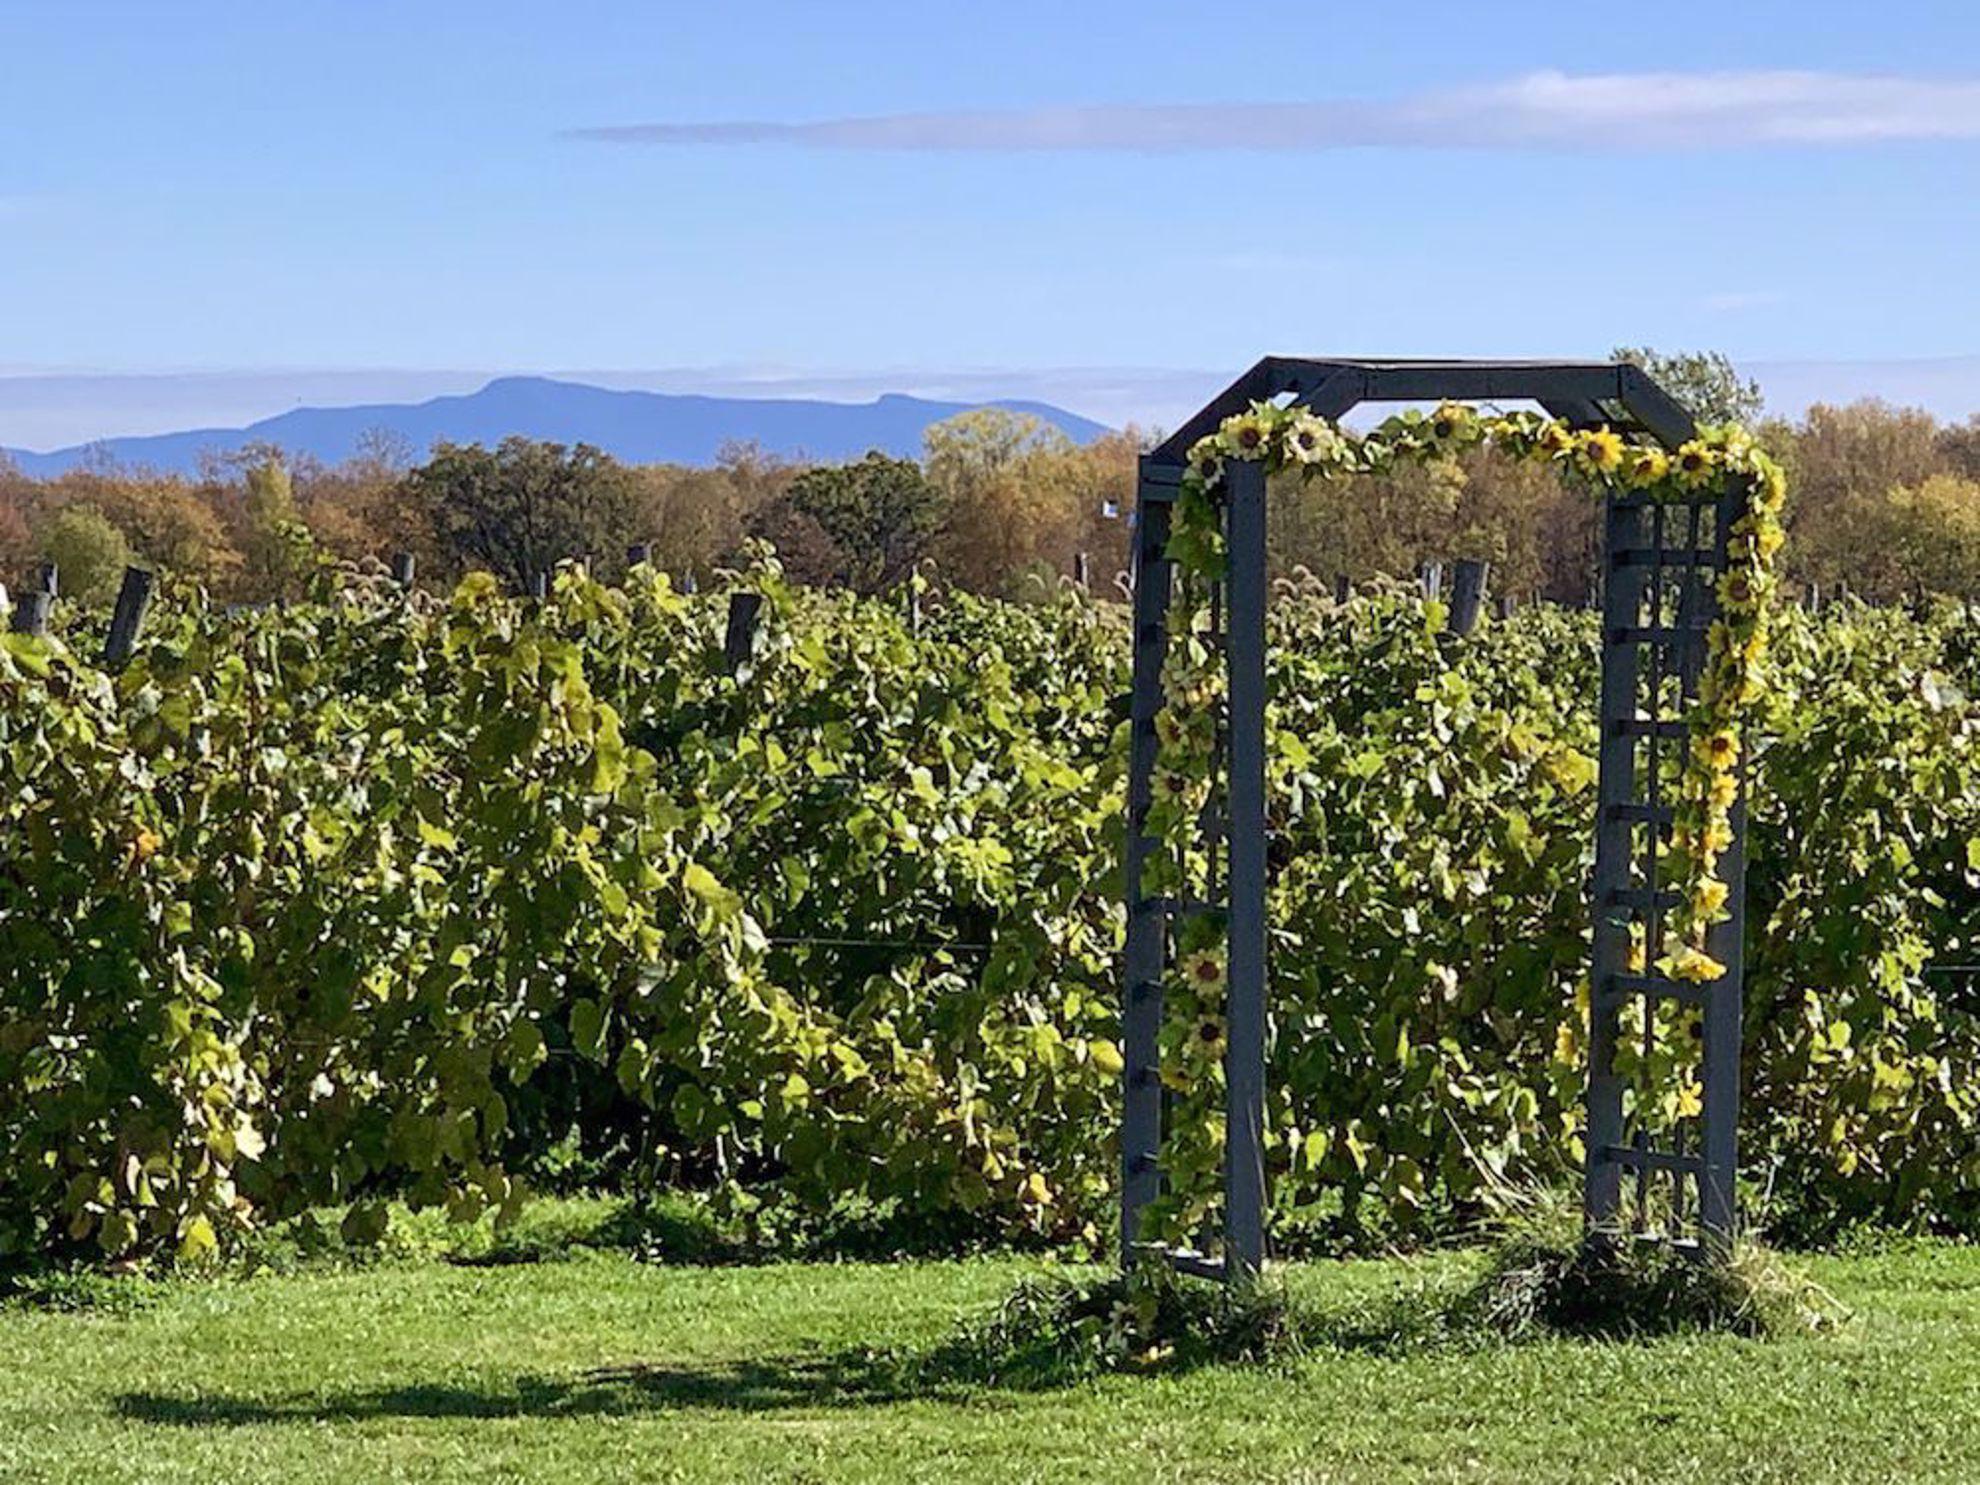 Vines, arbor, mountains